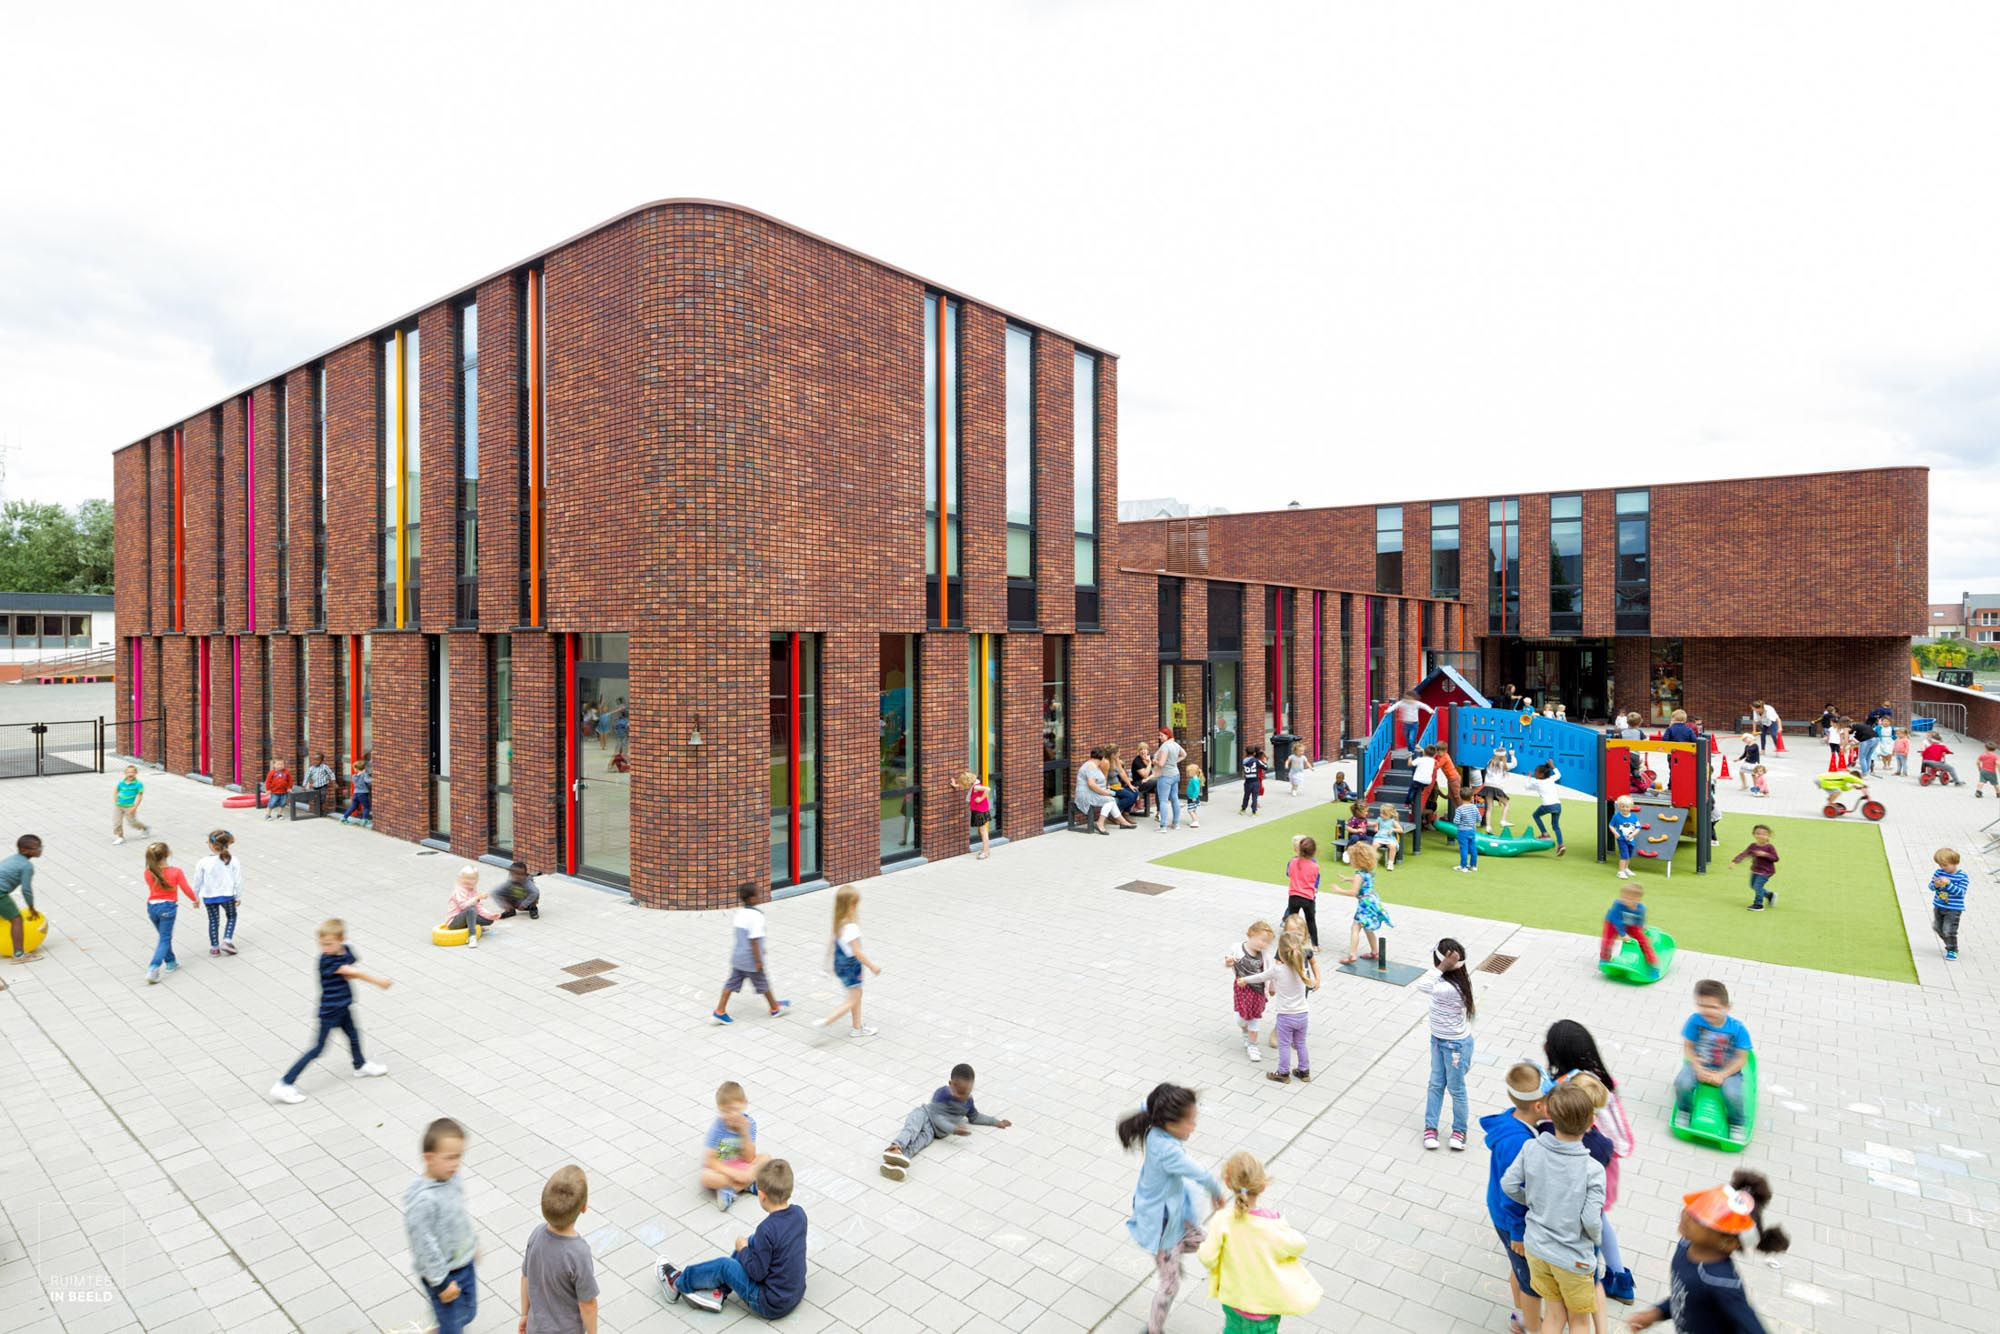 School: Sint Aloysiuscollege